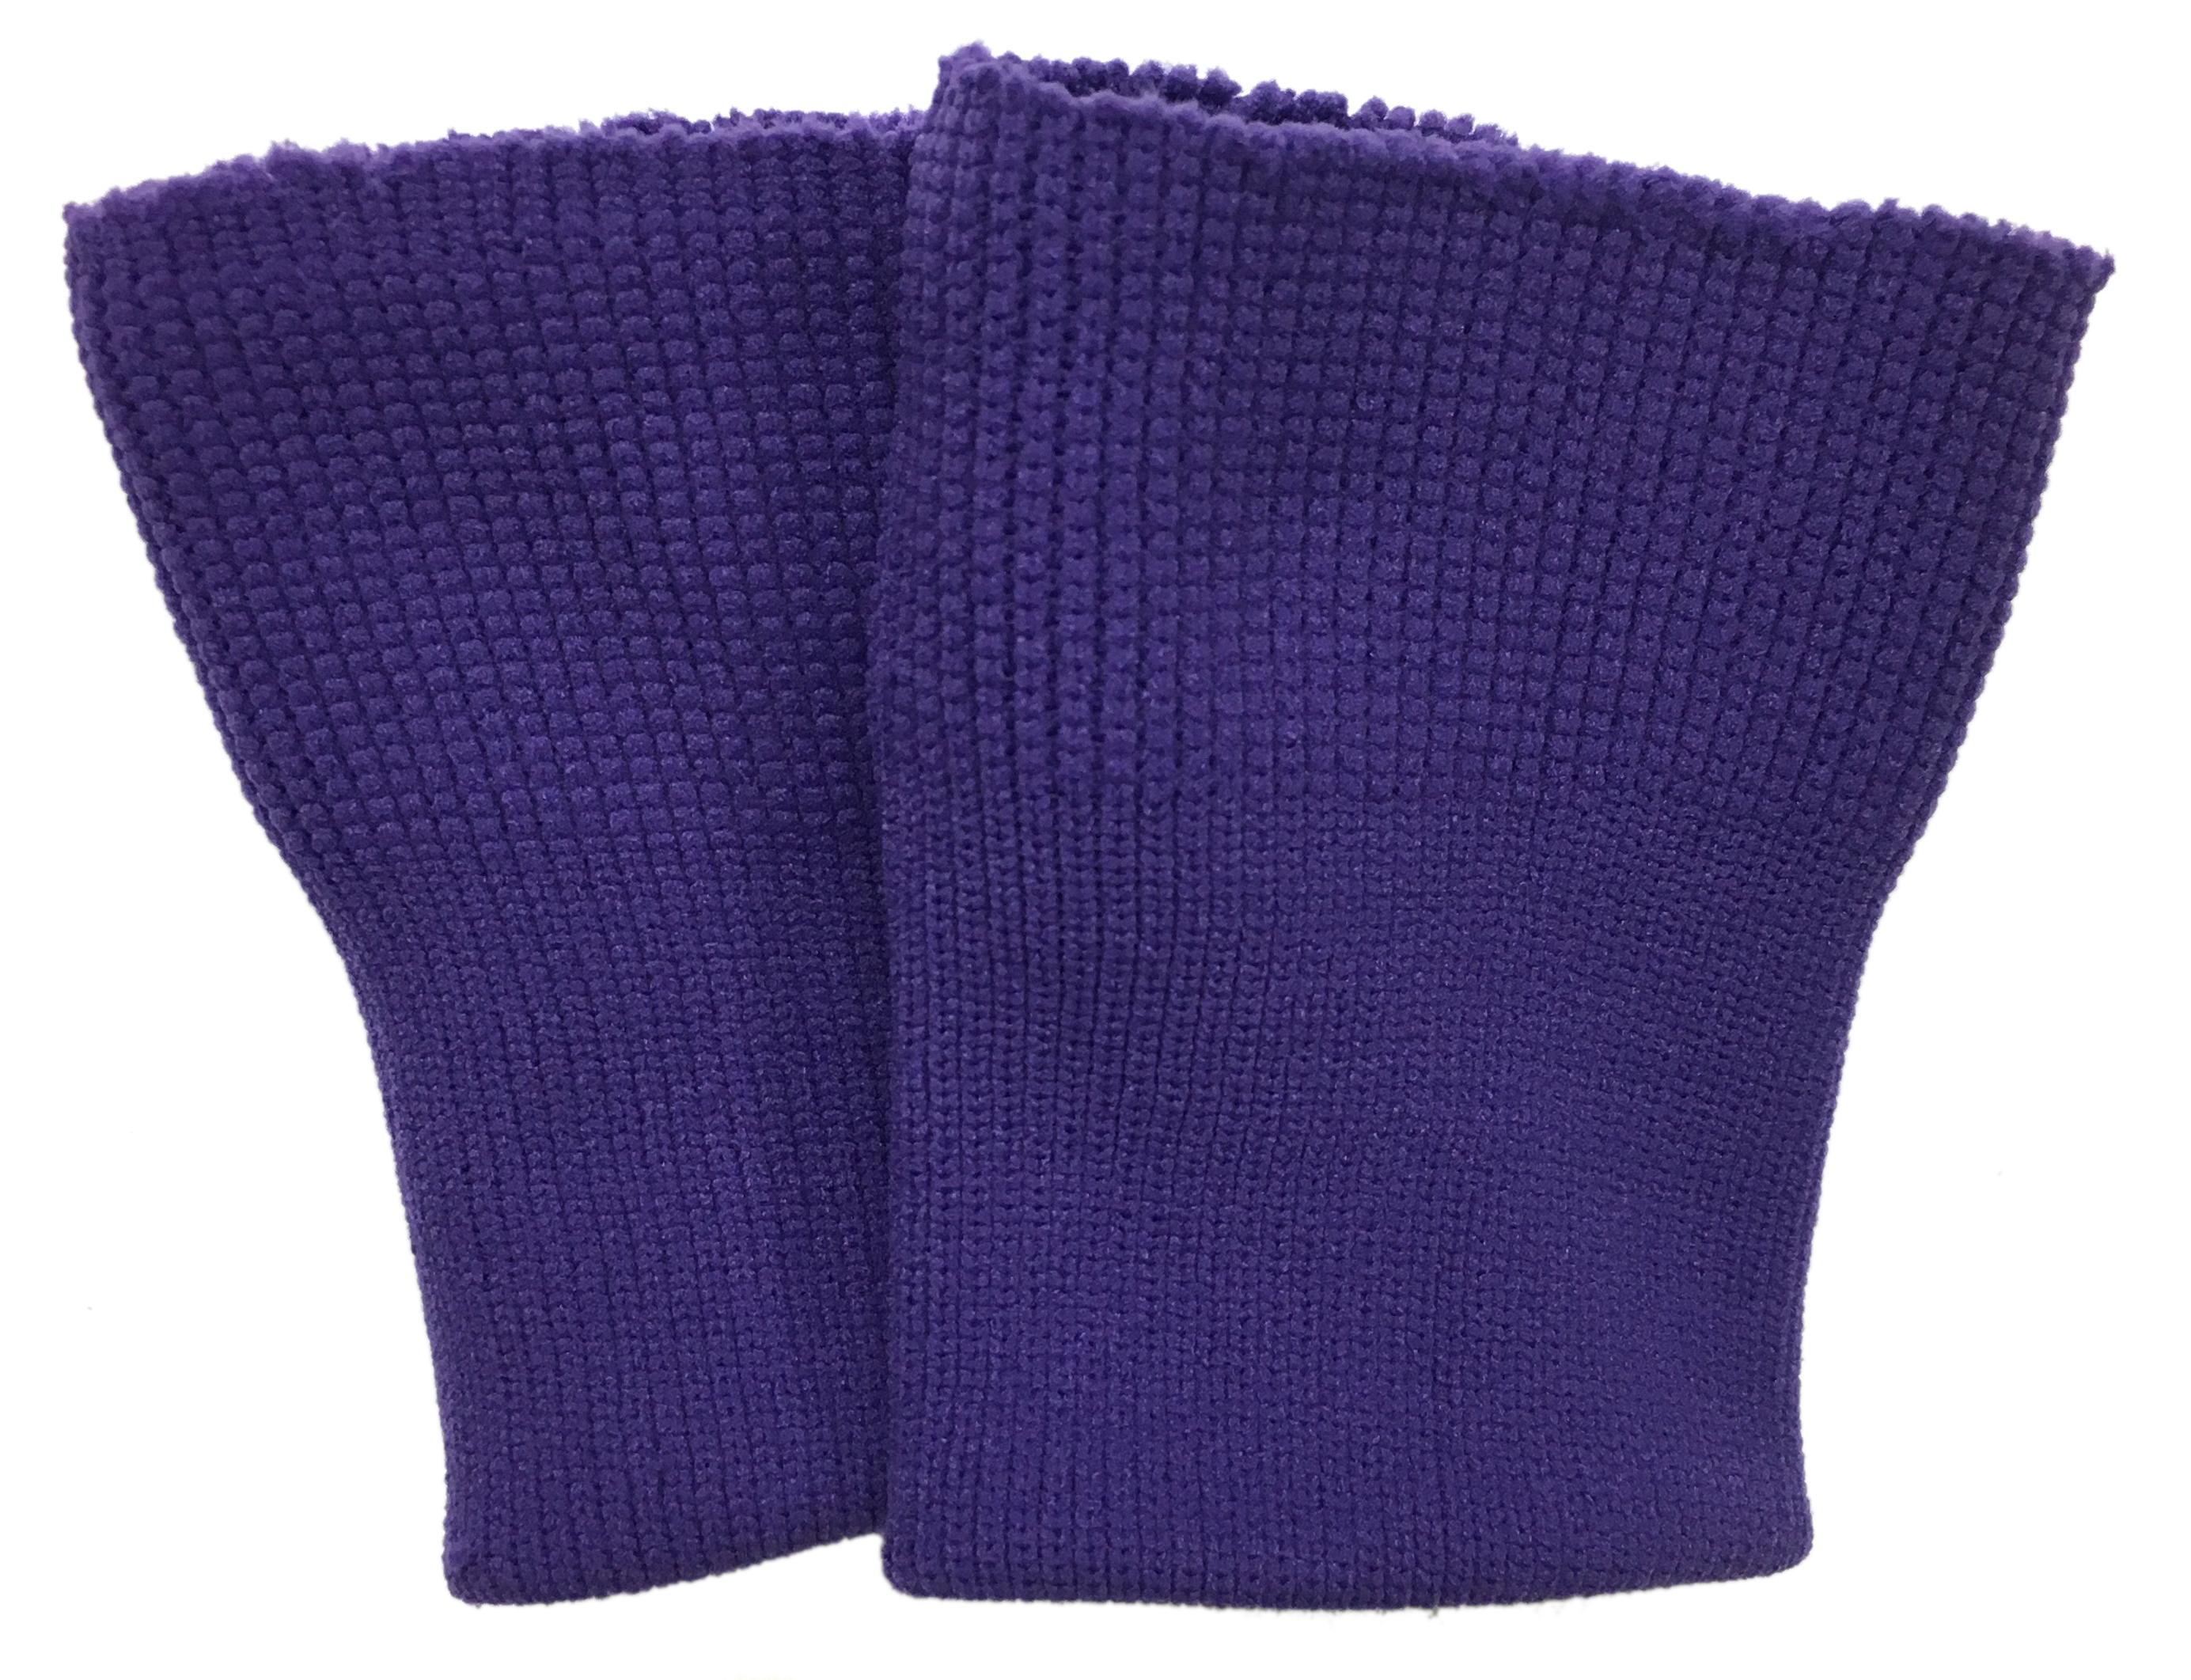 Standard Cuffs - Purple